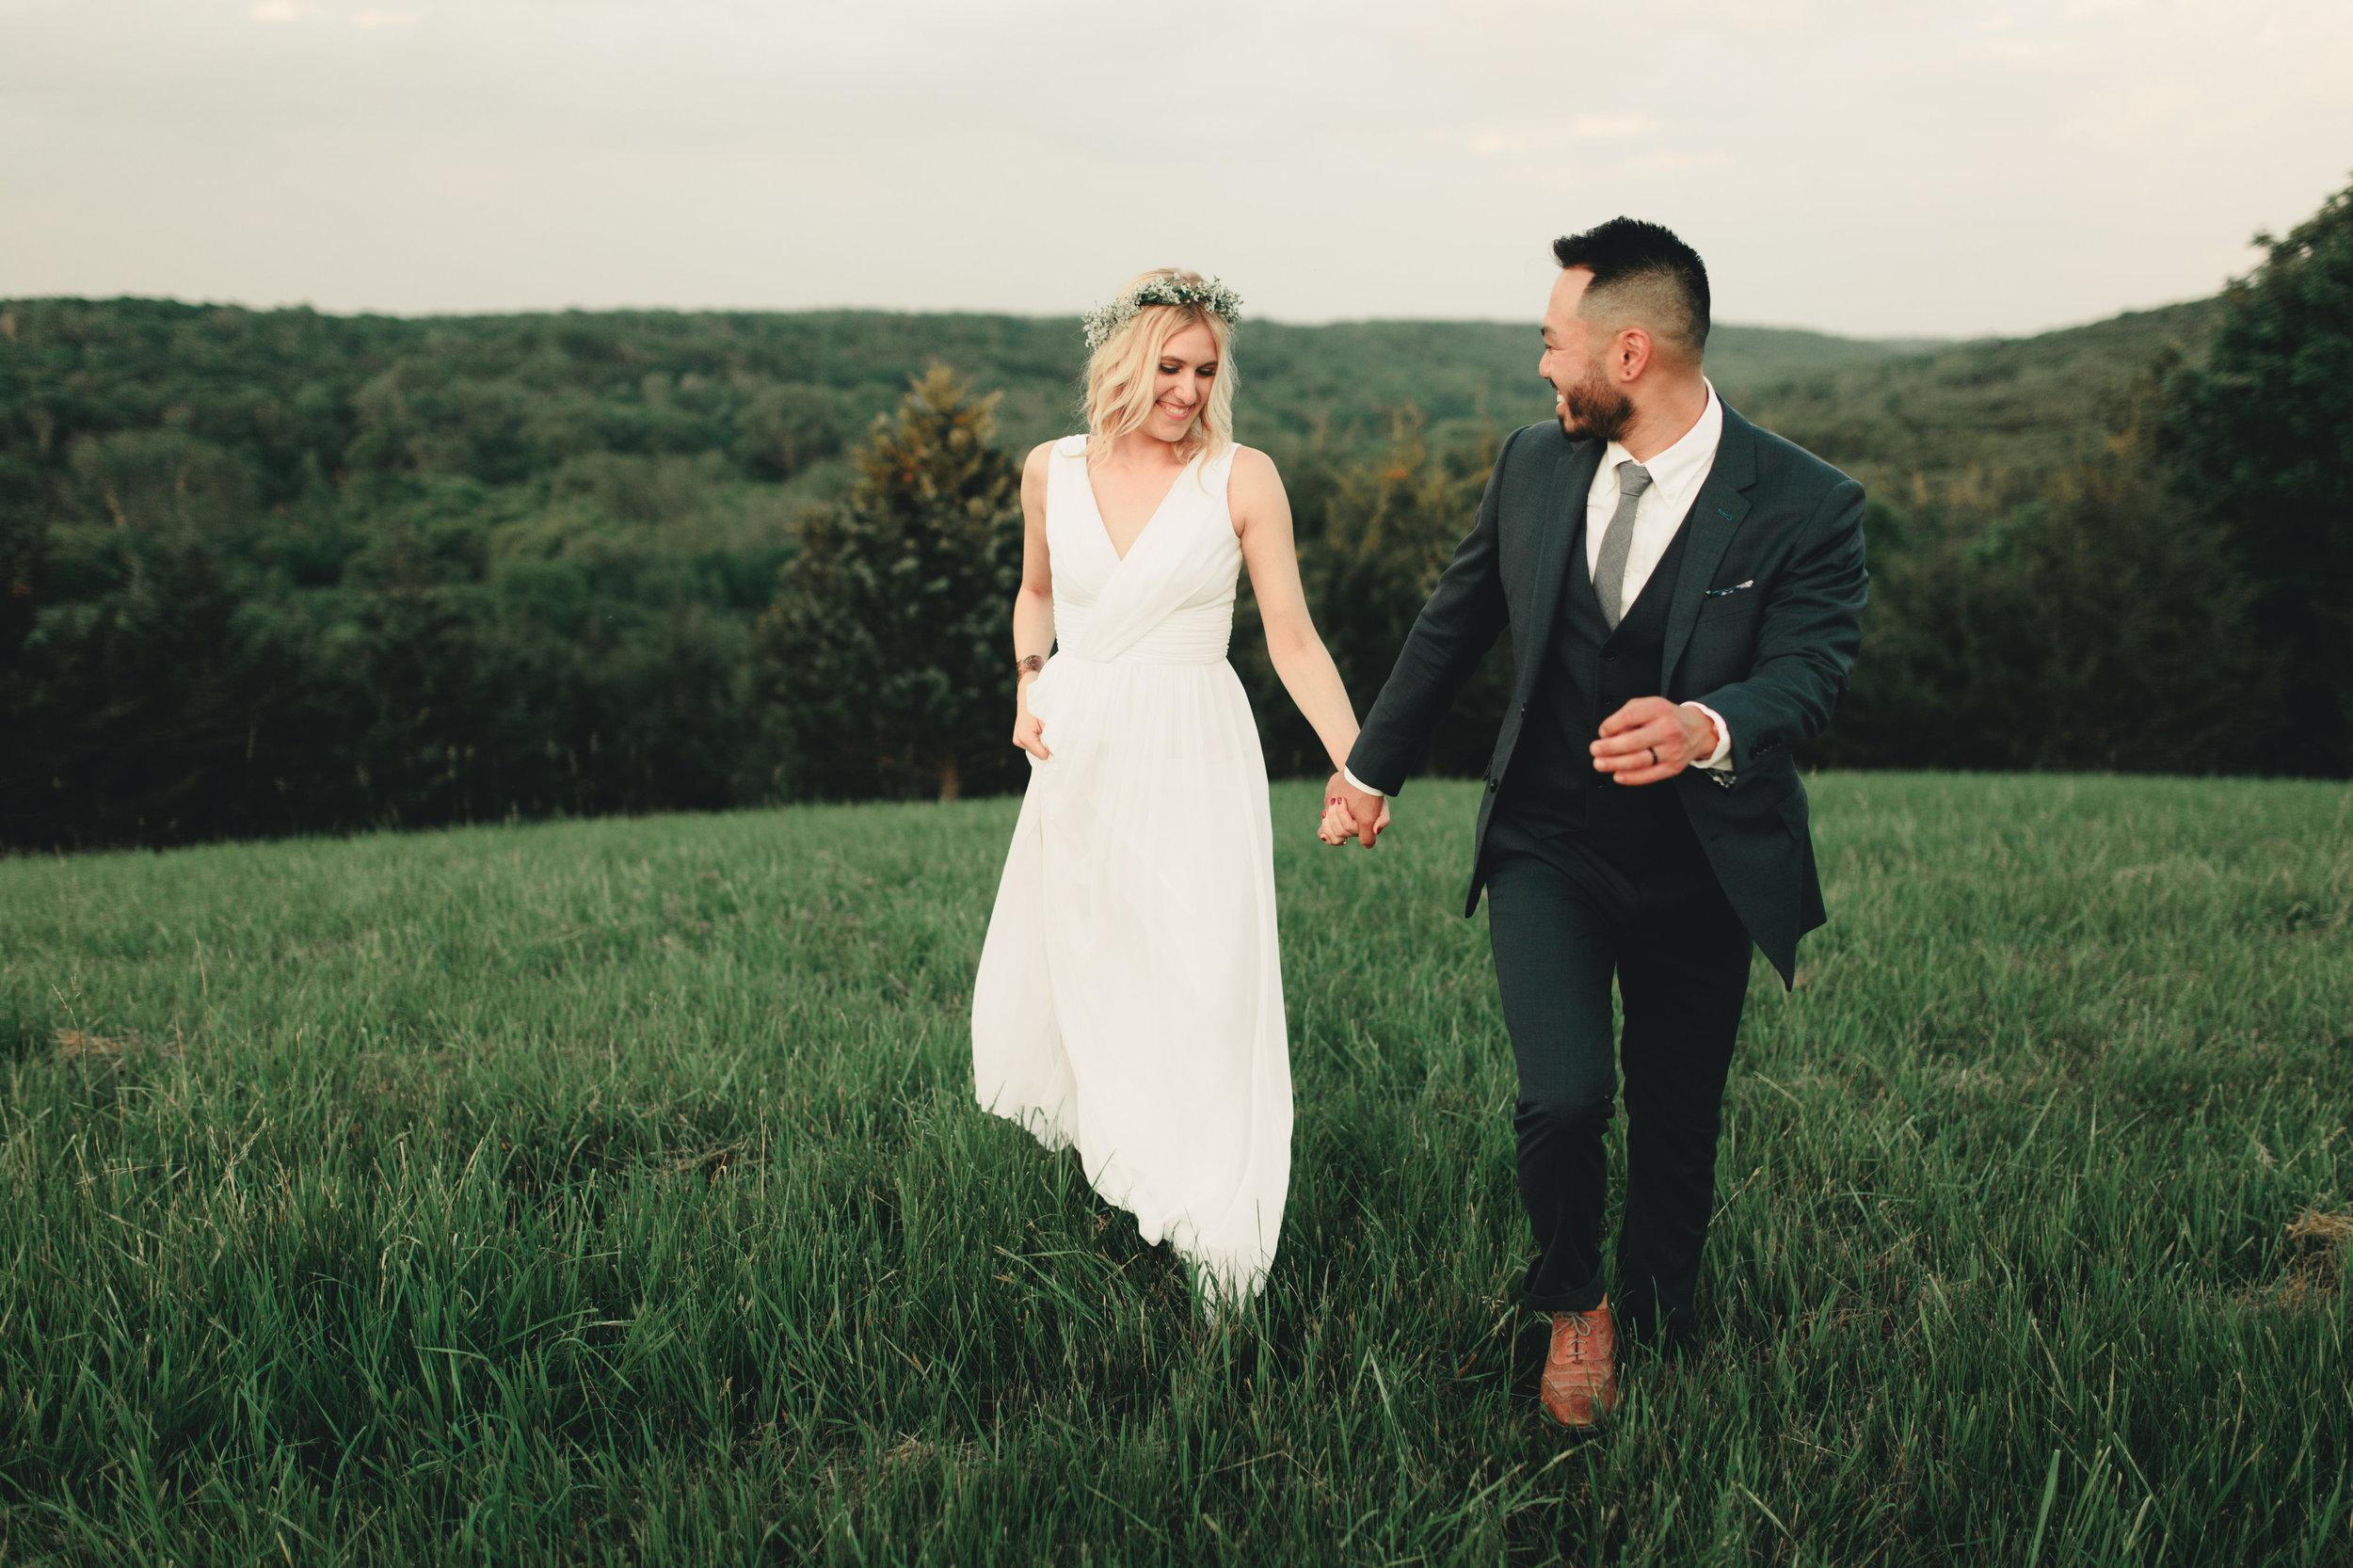 Emily and Zach-Wedding Finals 2-0158.jpg